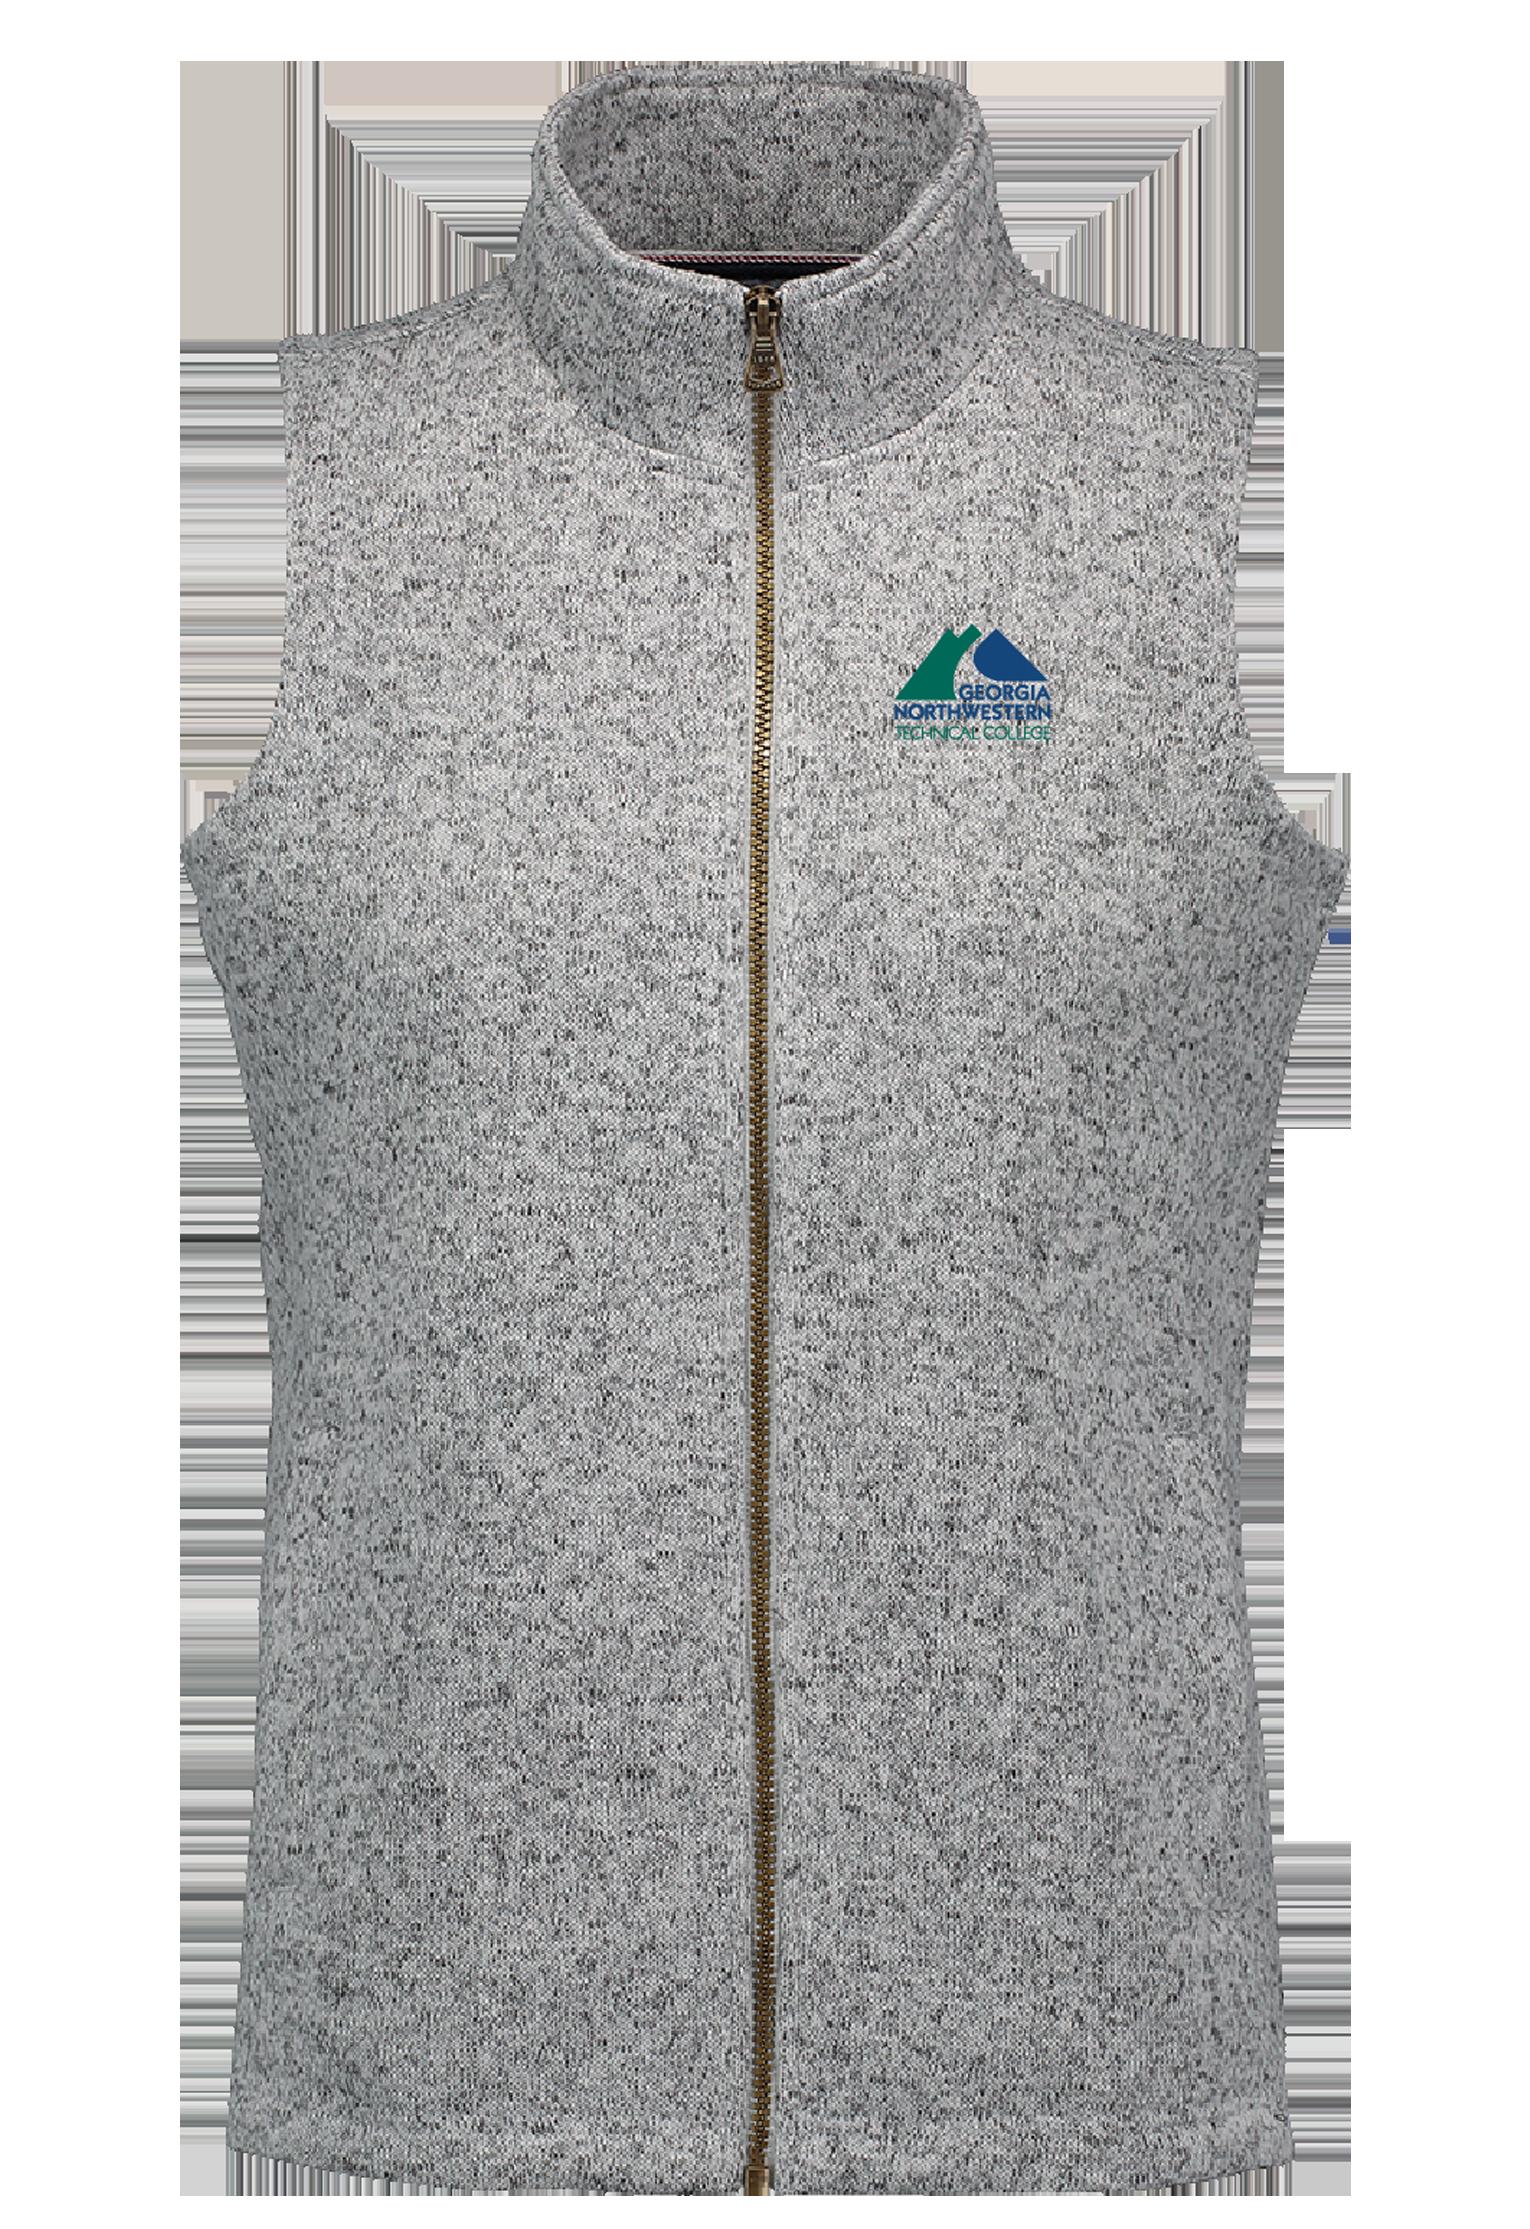 GNTC Ladies Sweaterfleece Vest